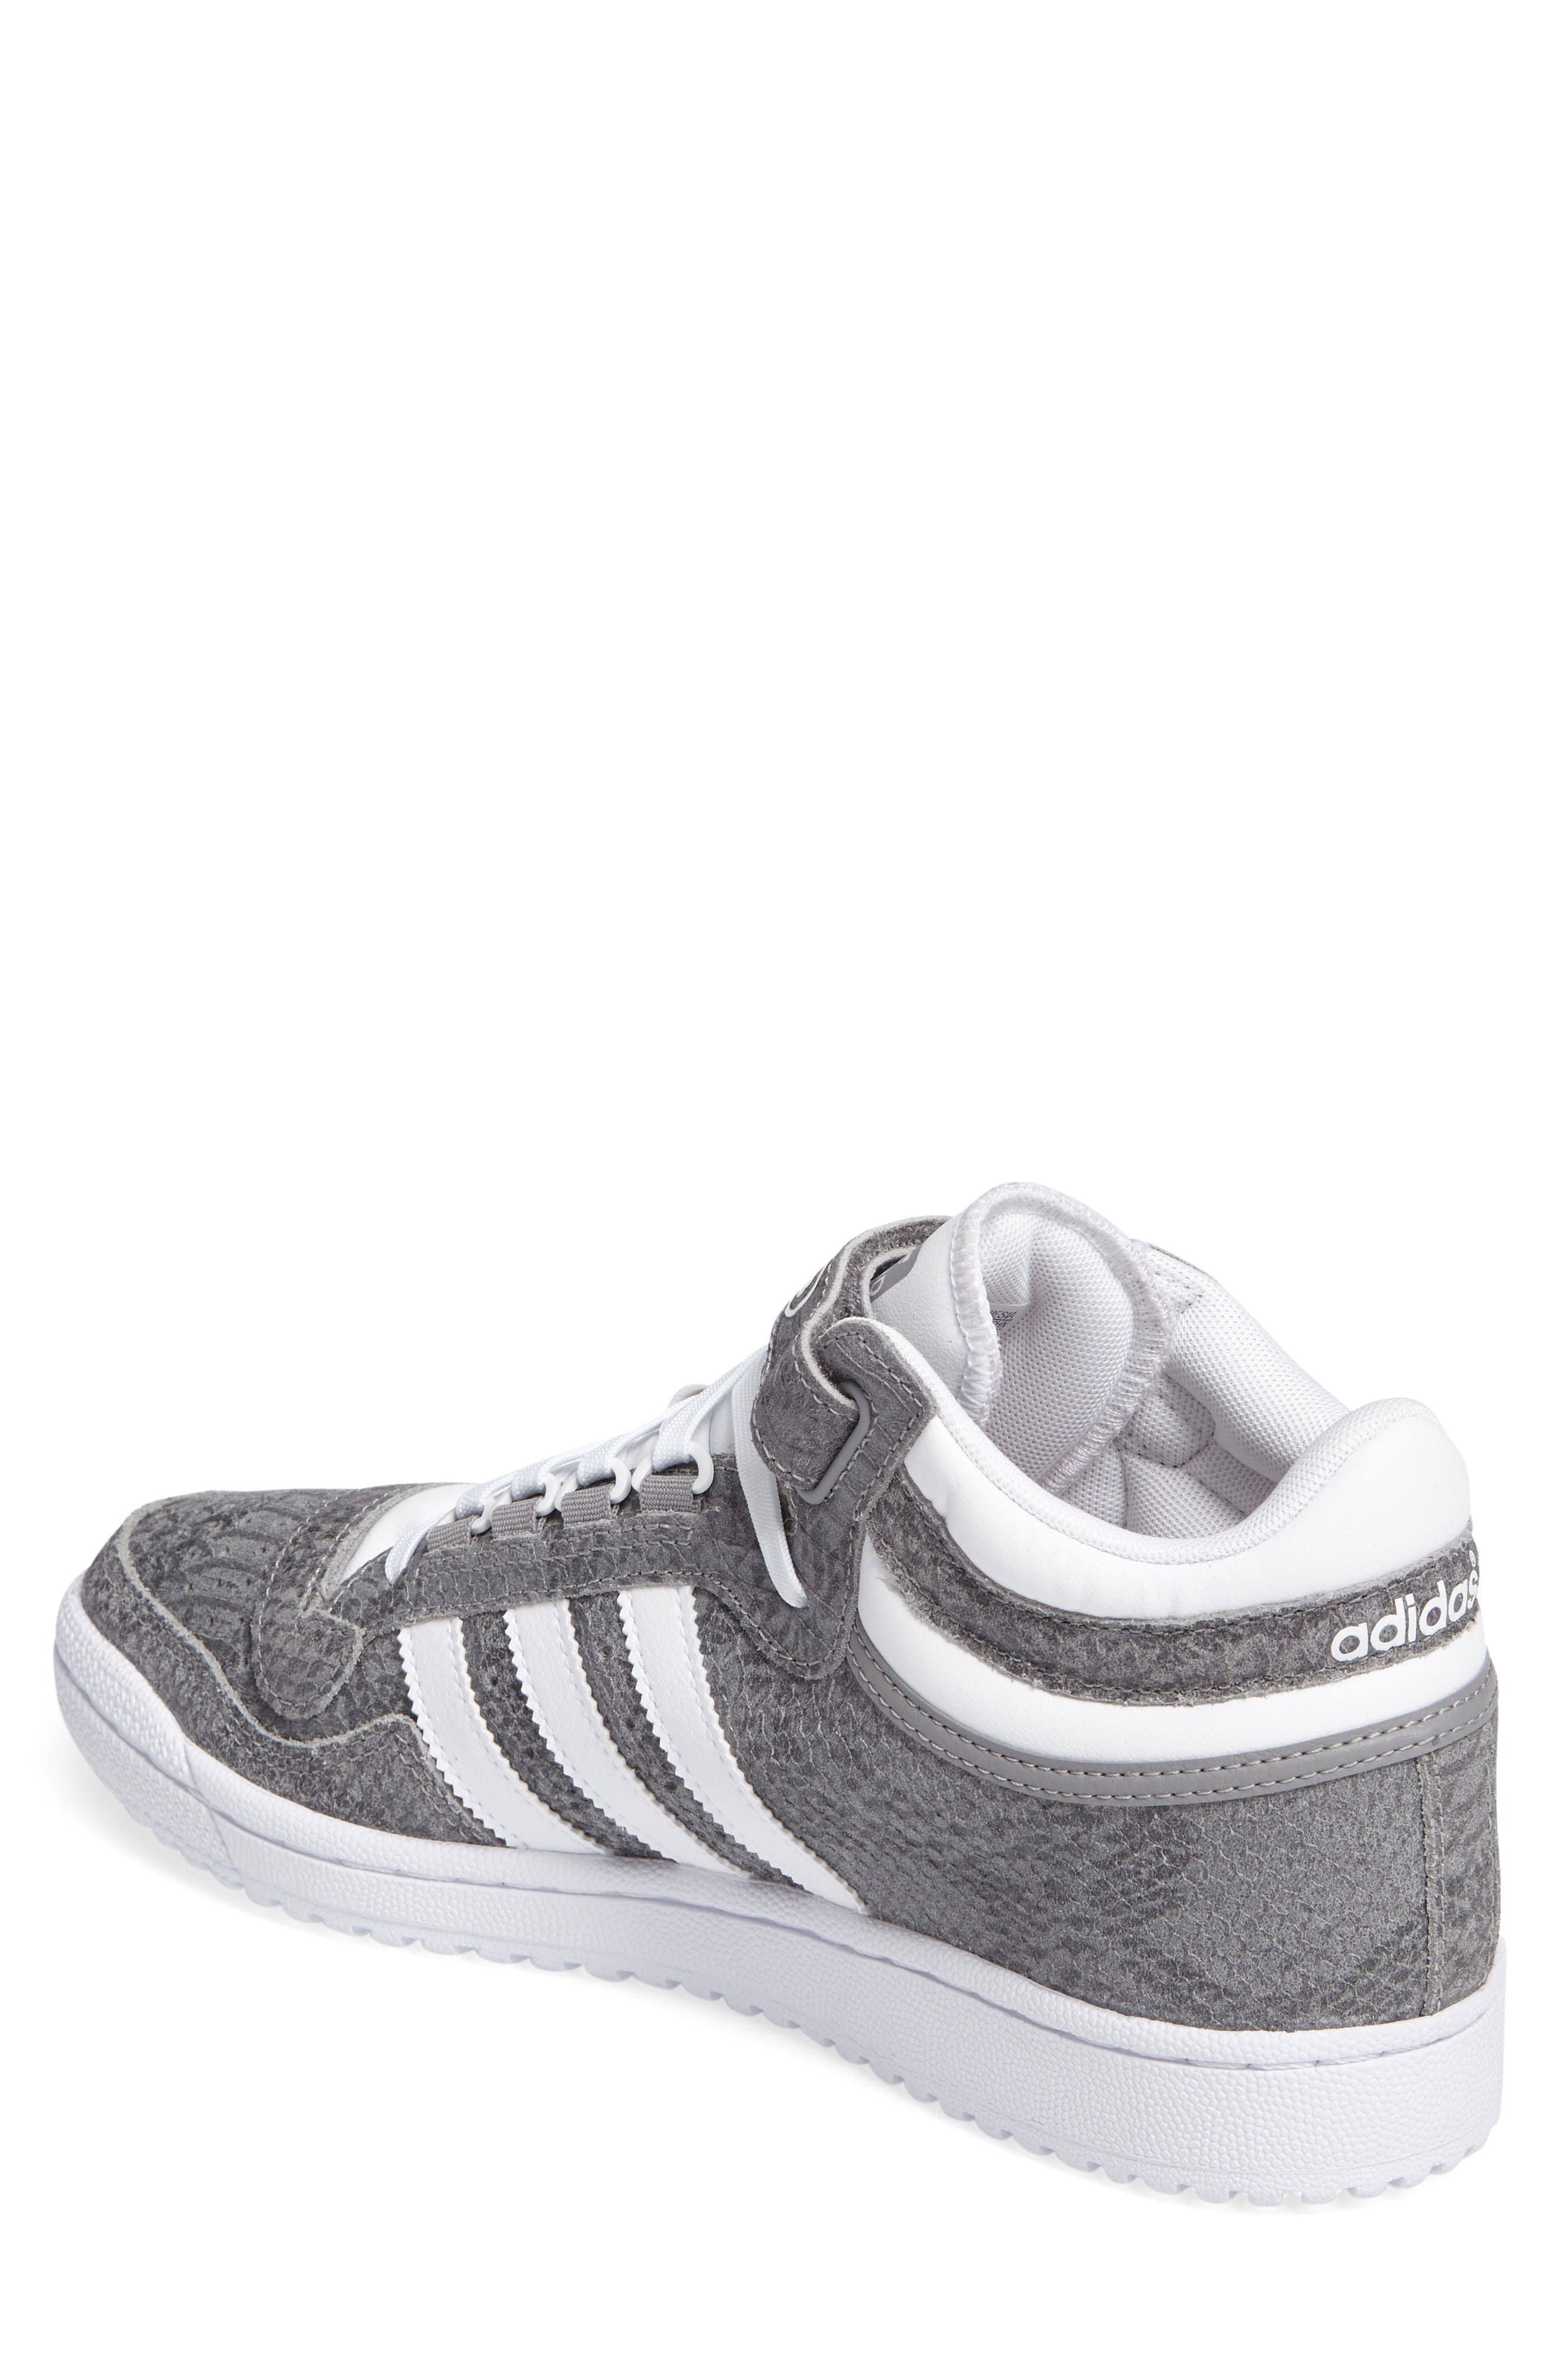 Alternate Image 2  - adidas Concord 2.0 Mid Sneaker (Women)